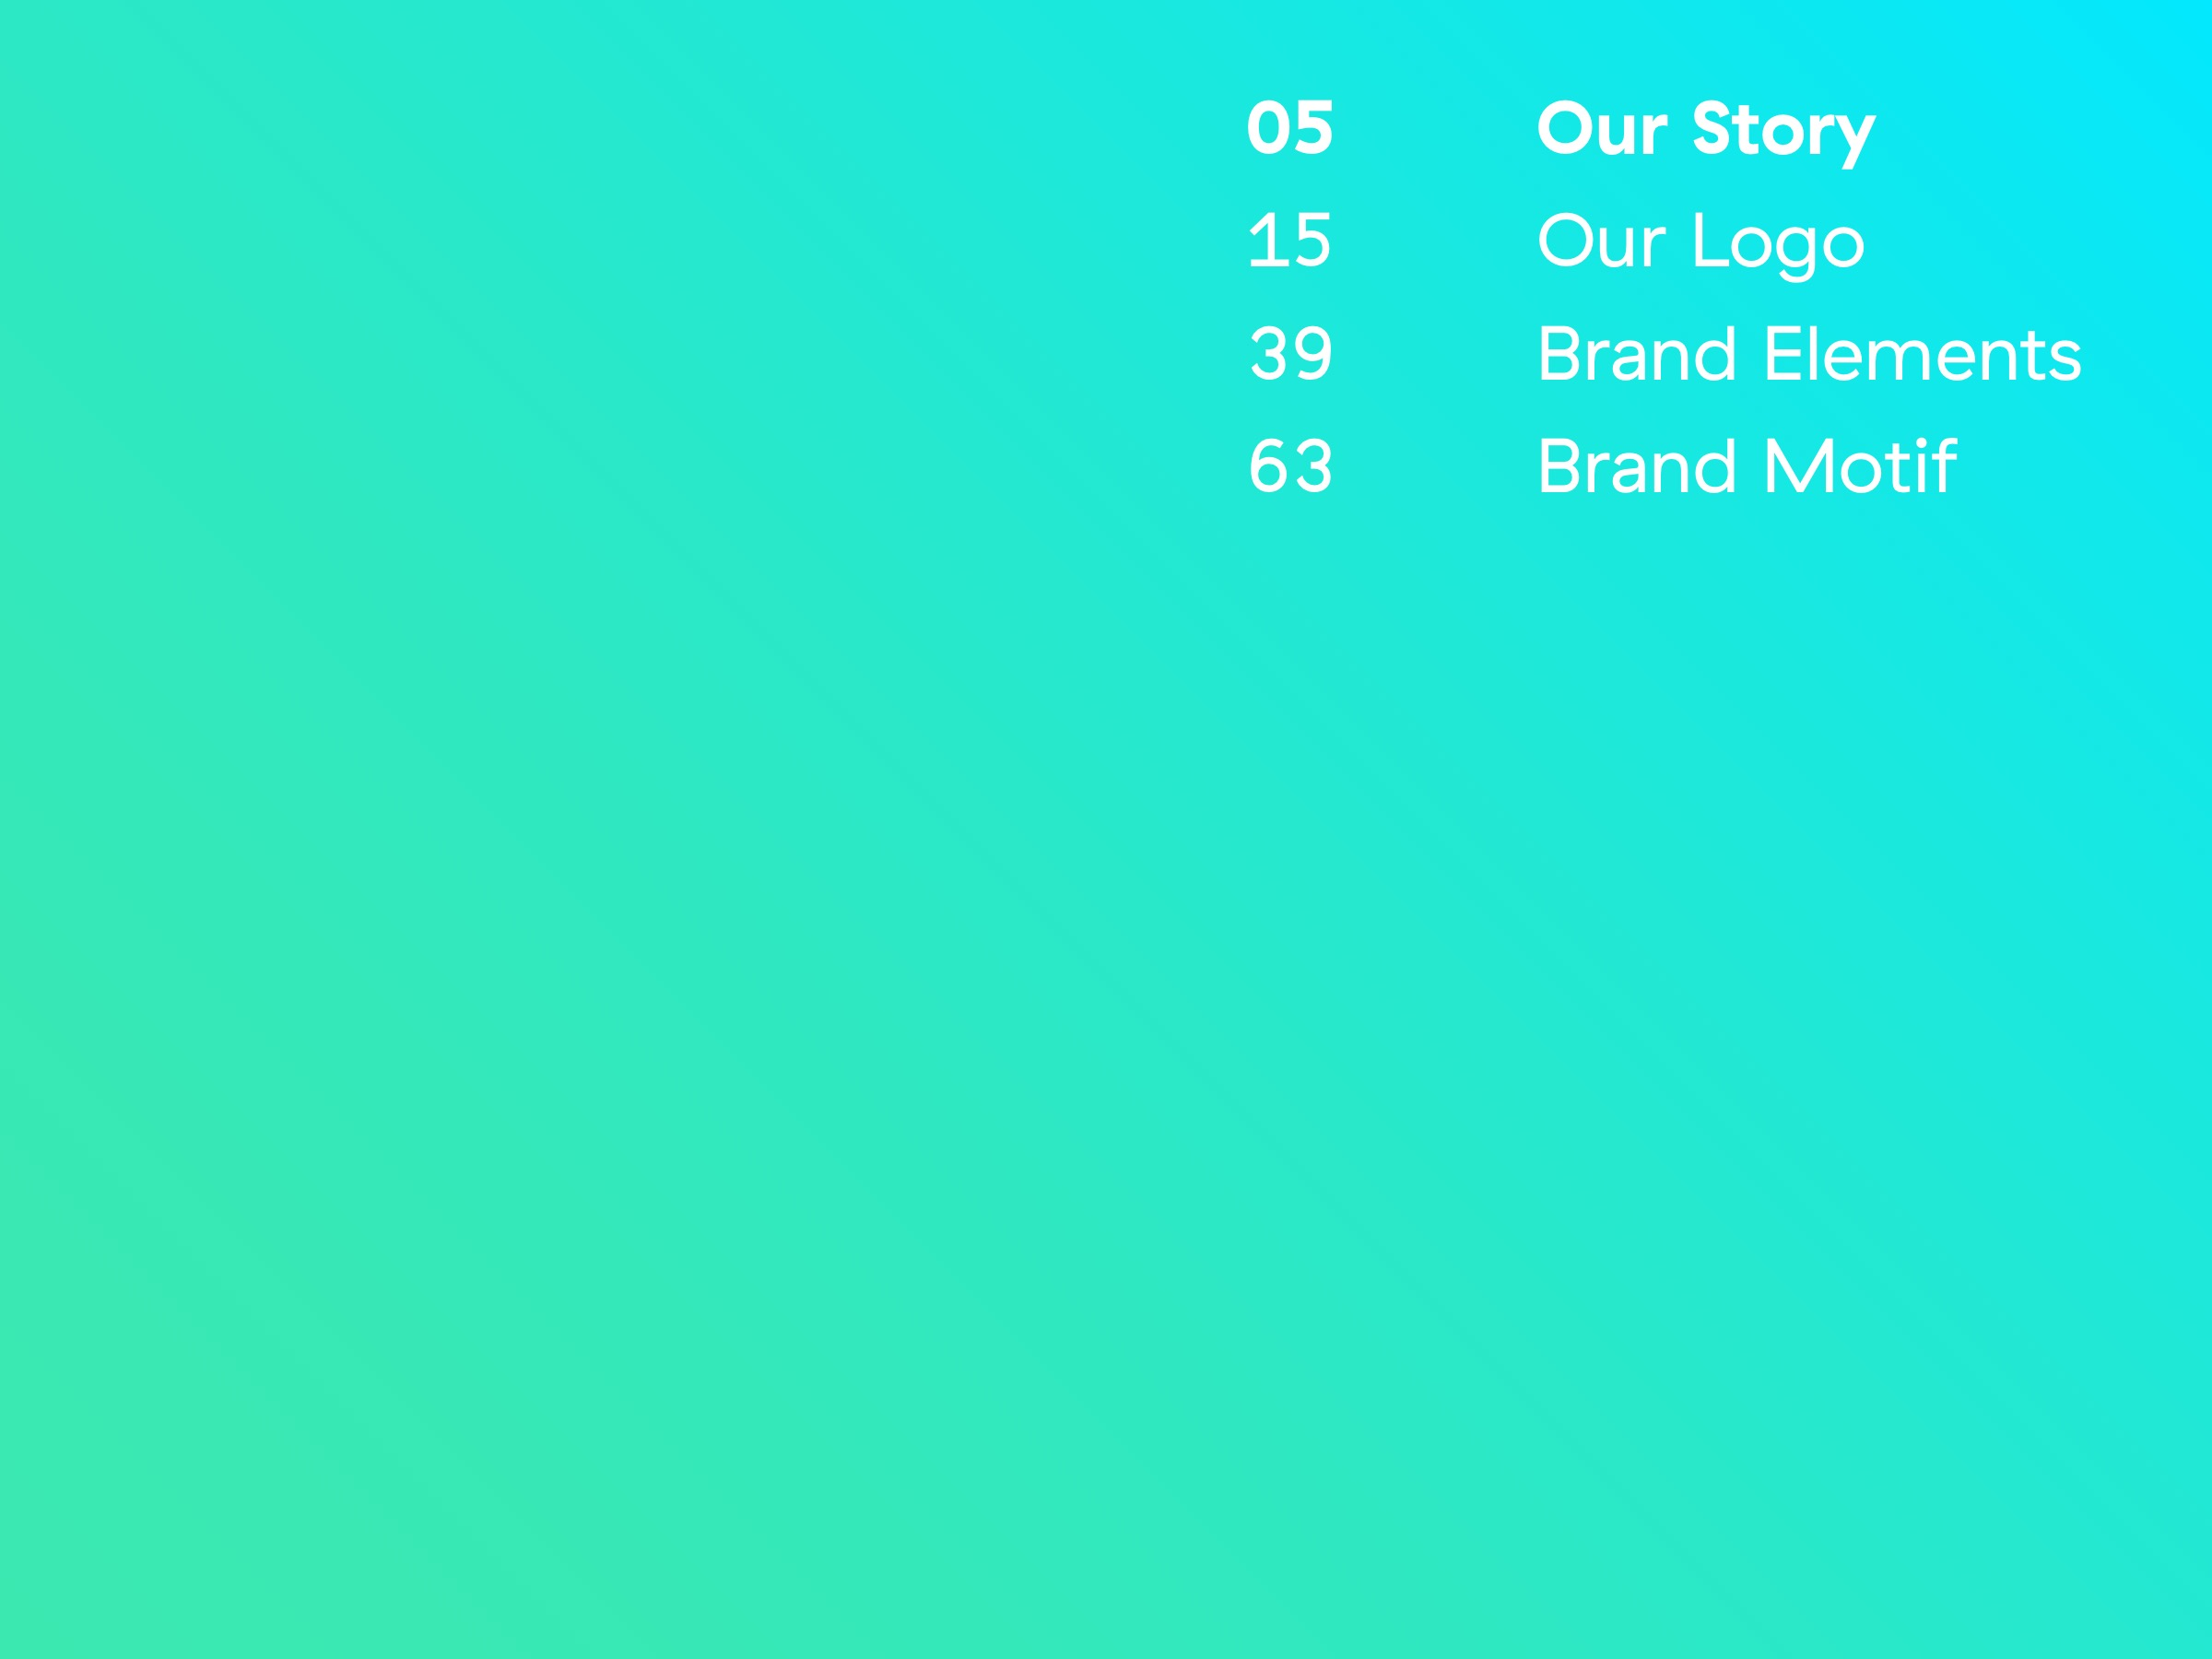 Asana-Brandbook-v1b 43.jpeg